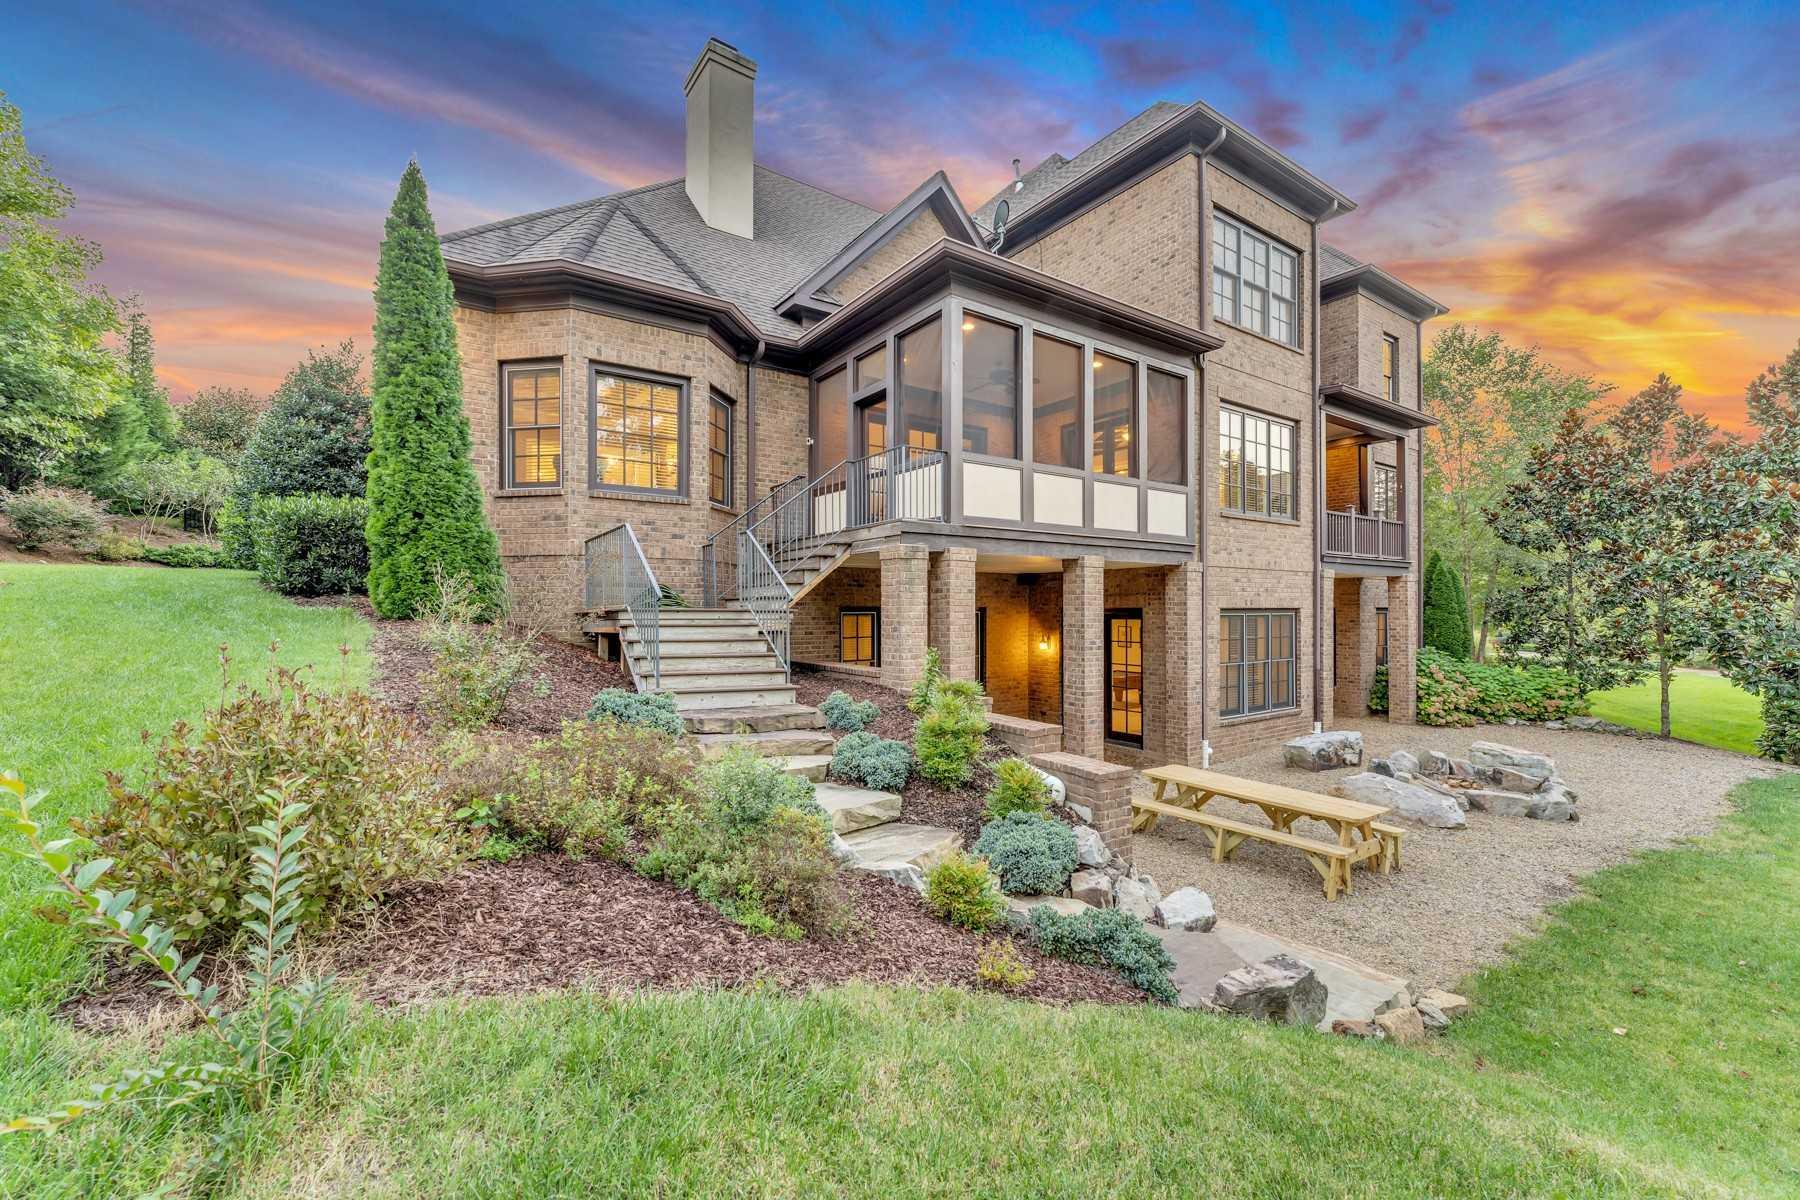 $2,500,000 - 5Br/7Ba -  for Sale in Stockett Creek Sec 1, Nashville